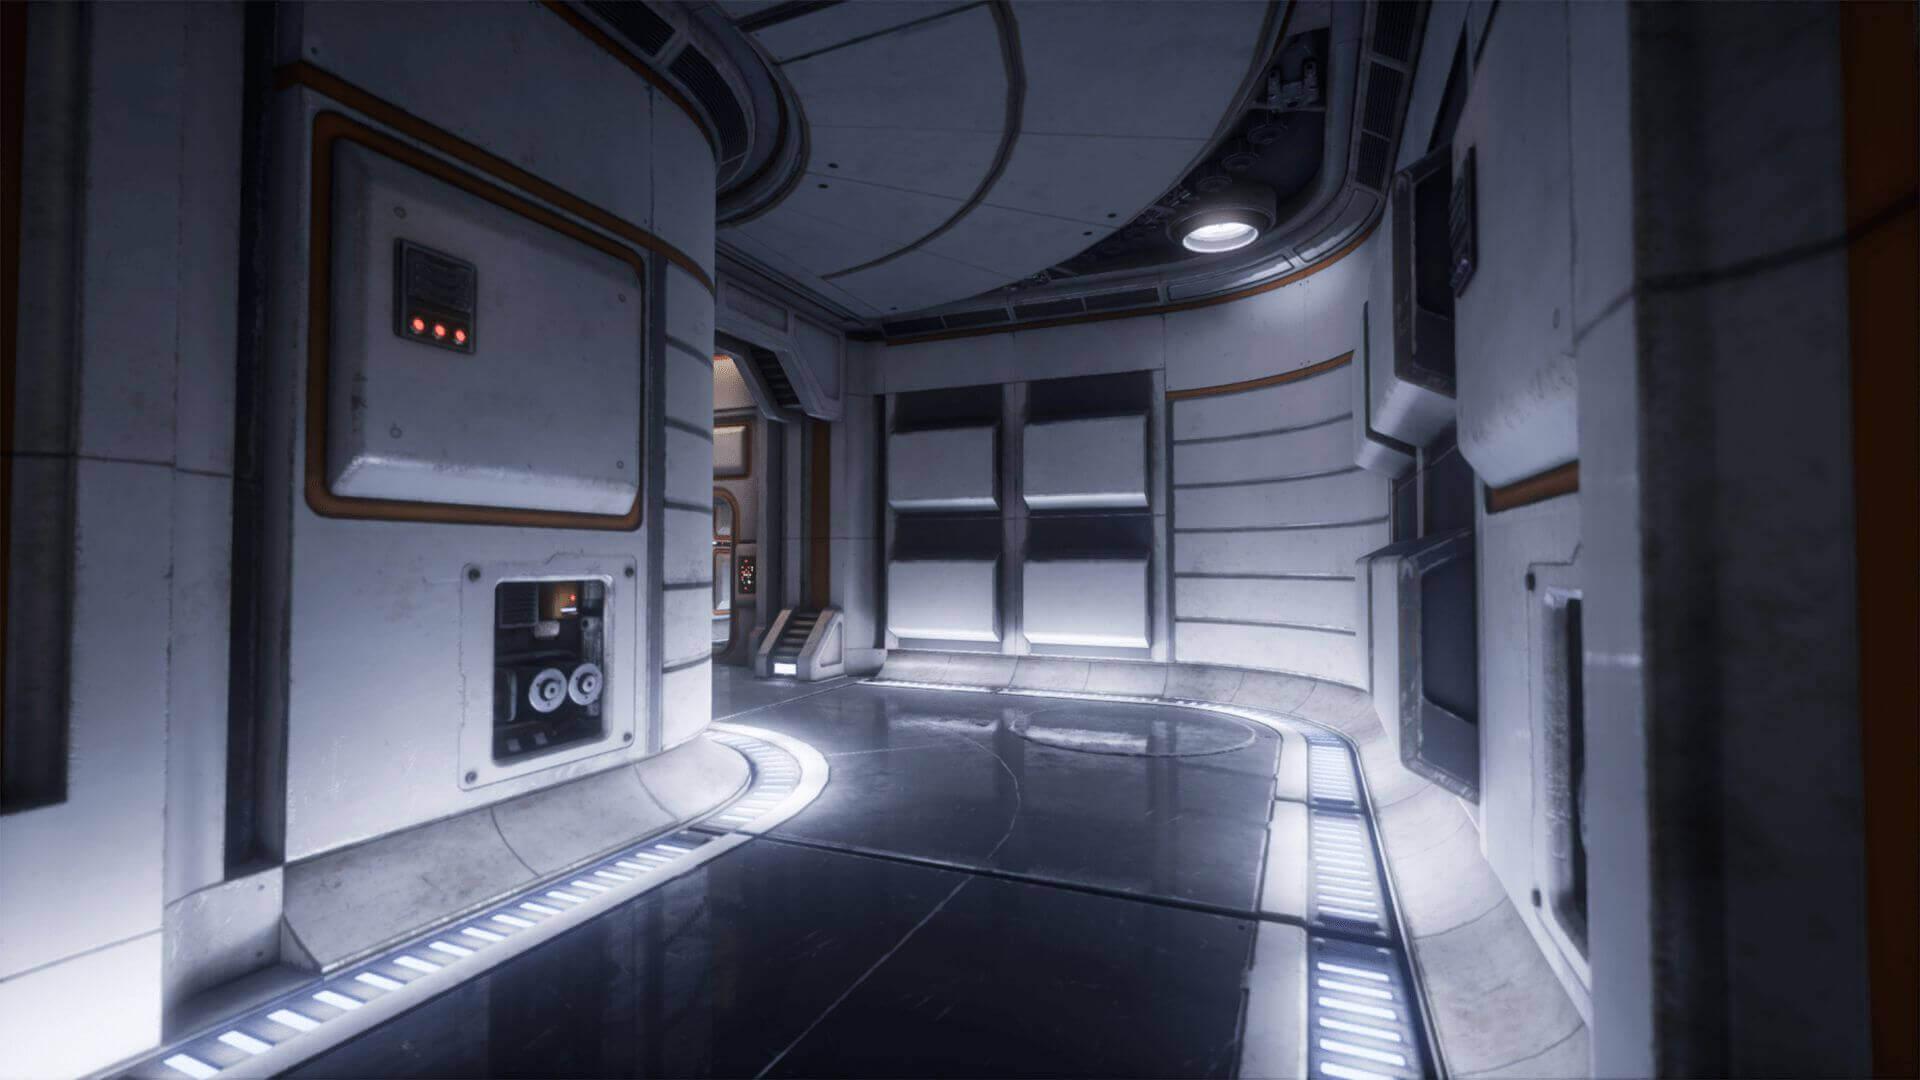 Sci fi ceiling texture Platform 0px 0px 0px 0px100 Icon Renderhub Scifi Interior Asset Pack 3d Model